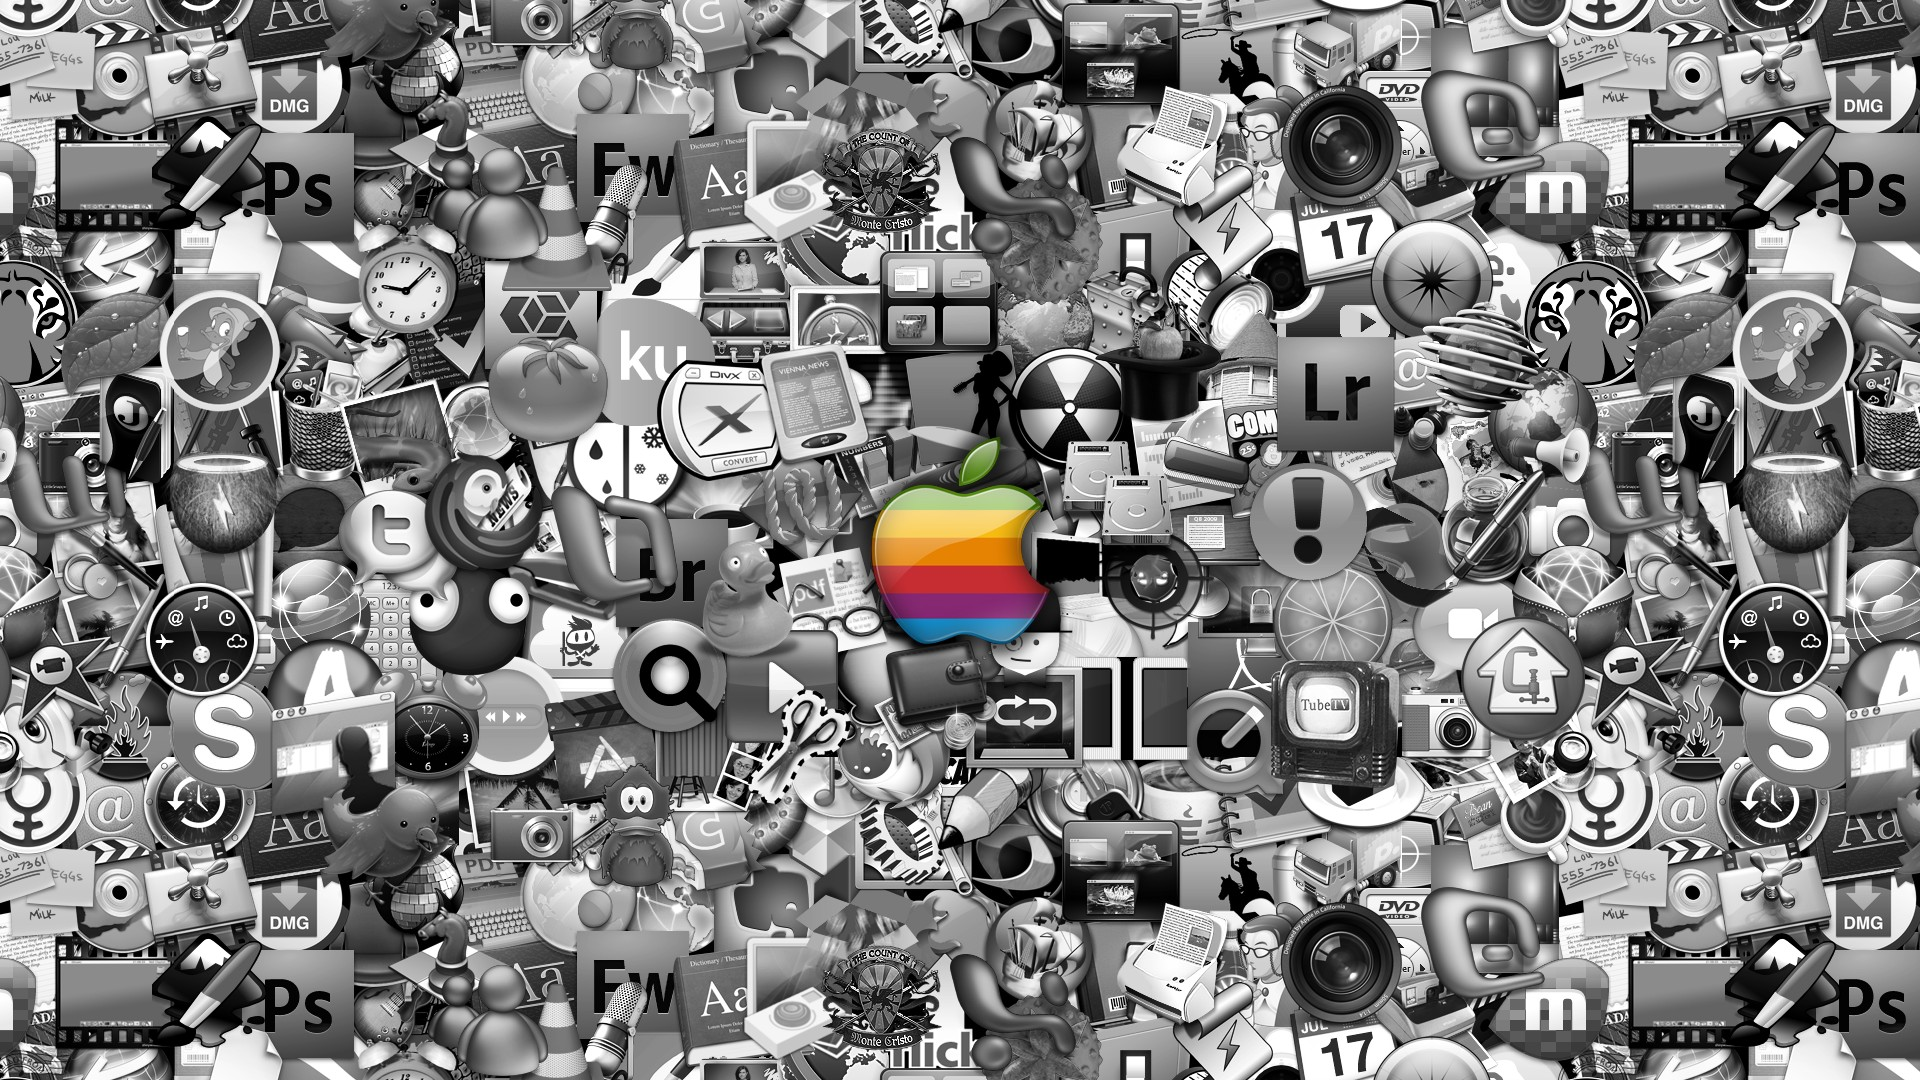 Apple New Tablet Hd Wallpaper